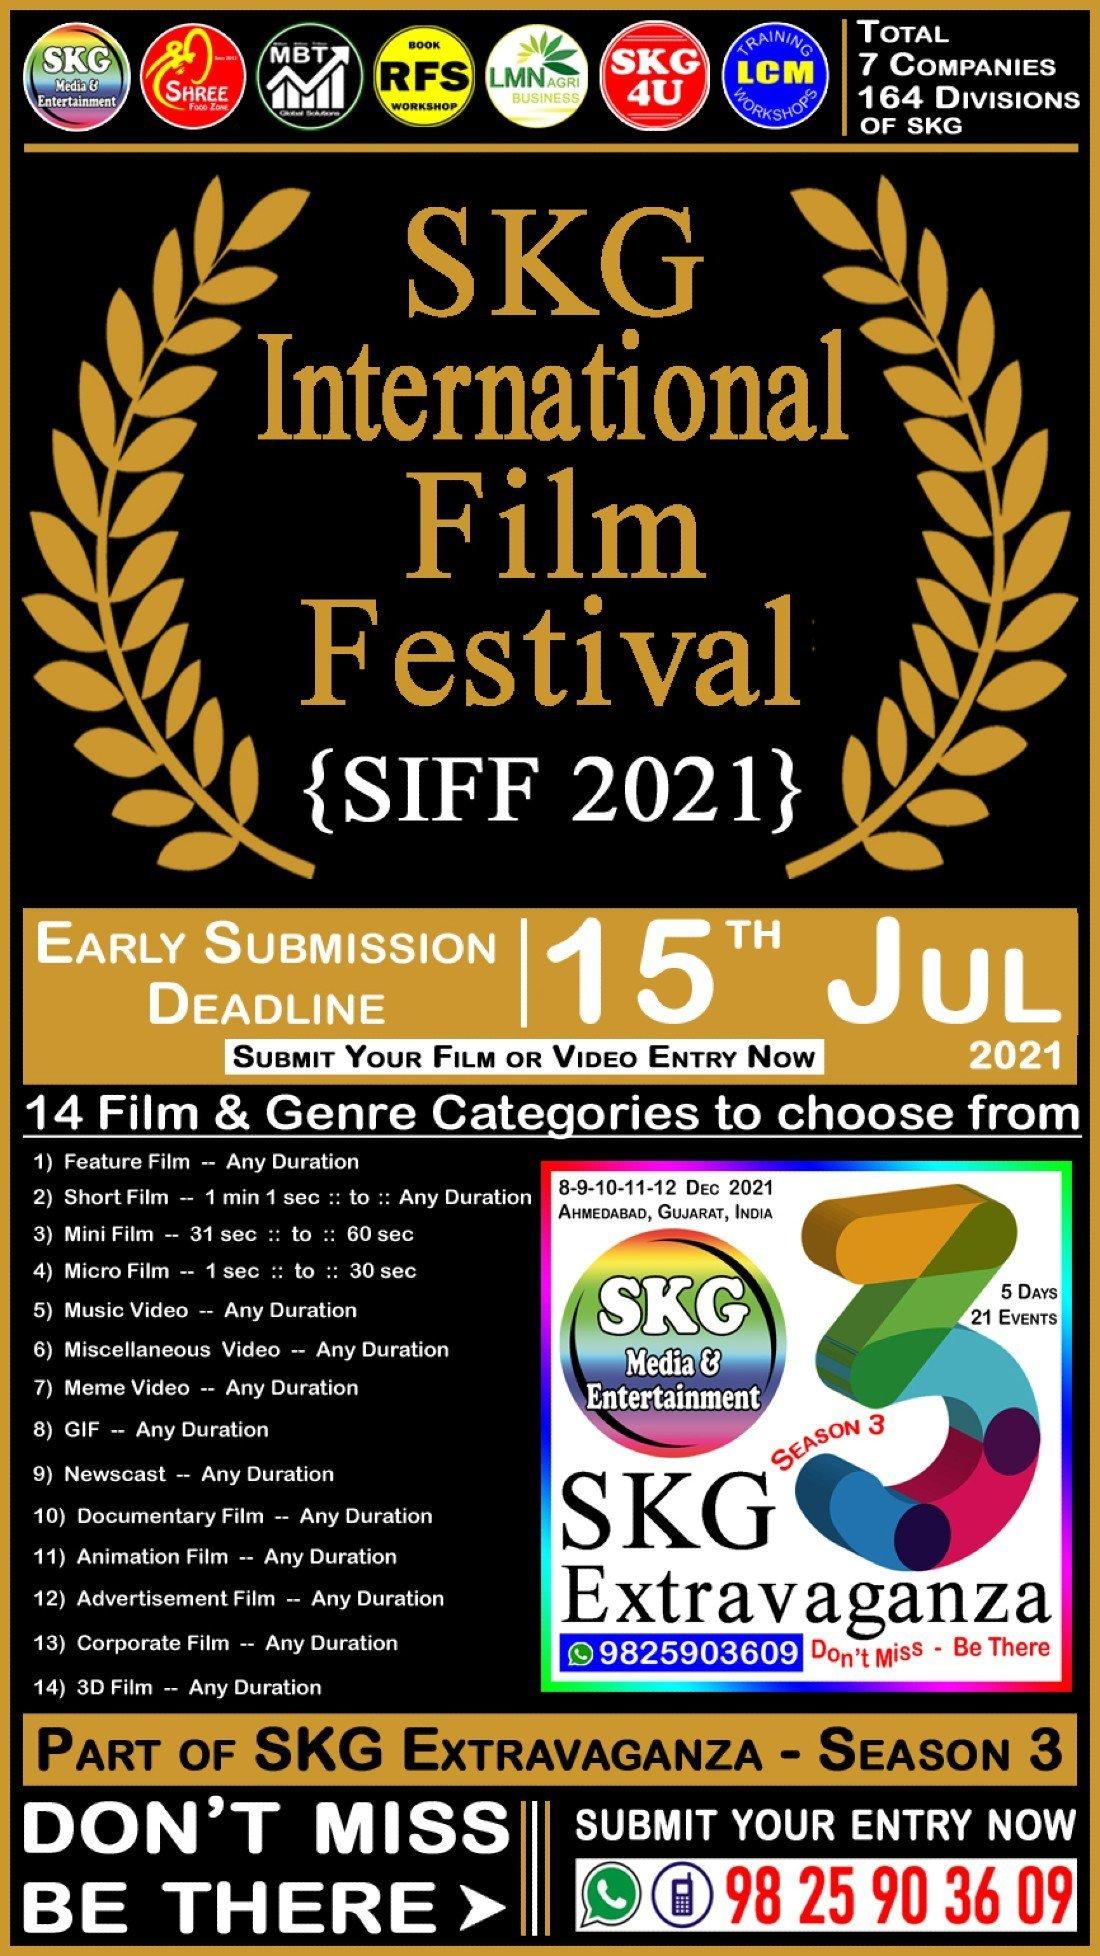 SIFF 2021 - SKG International Film Festival (( Event No 1 of 21 - SKG Extravaganza Season 3 )), 8 December